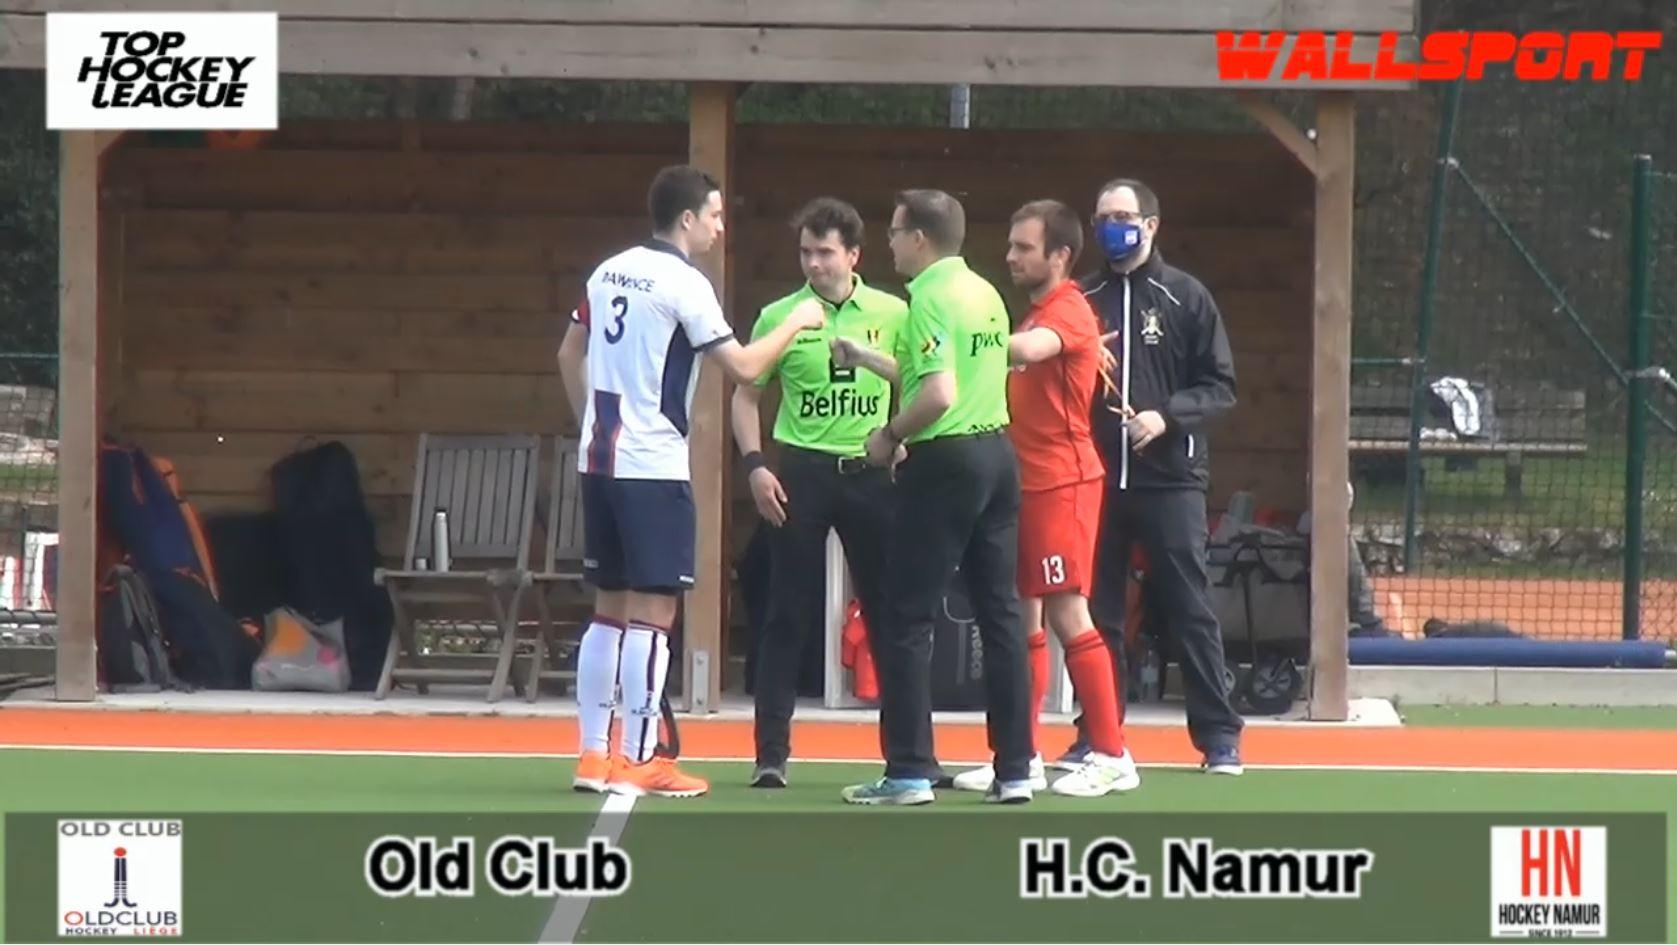 Old Club – H.C. Namur